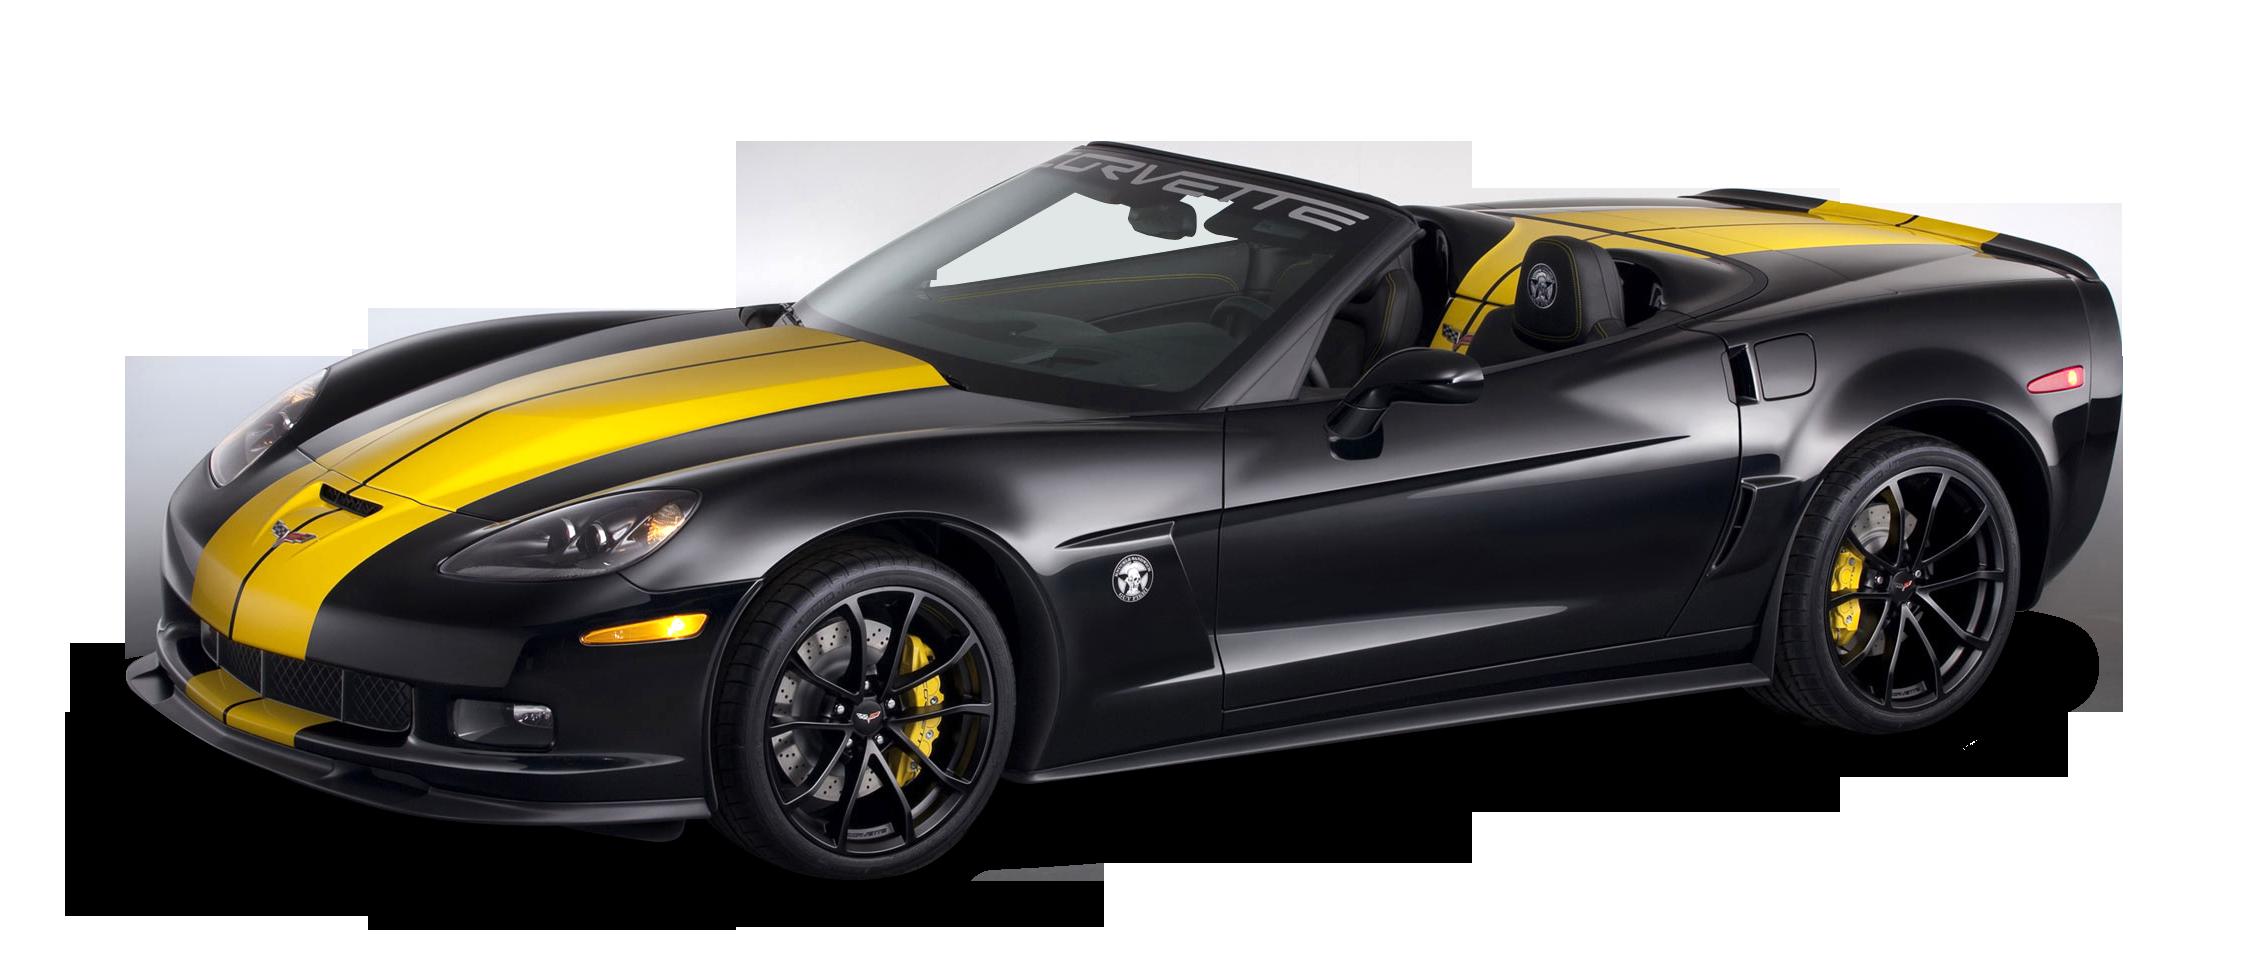 Chevrolet Corvette 427 Convertible Car